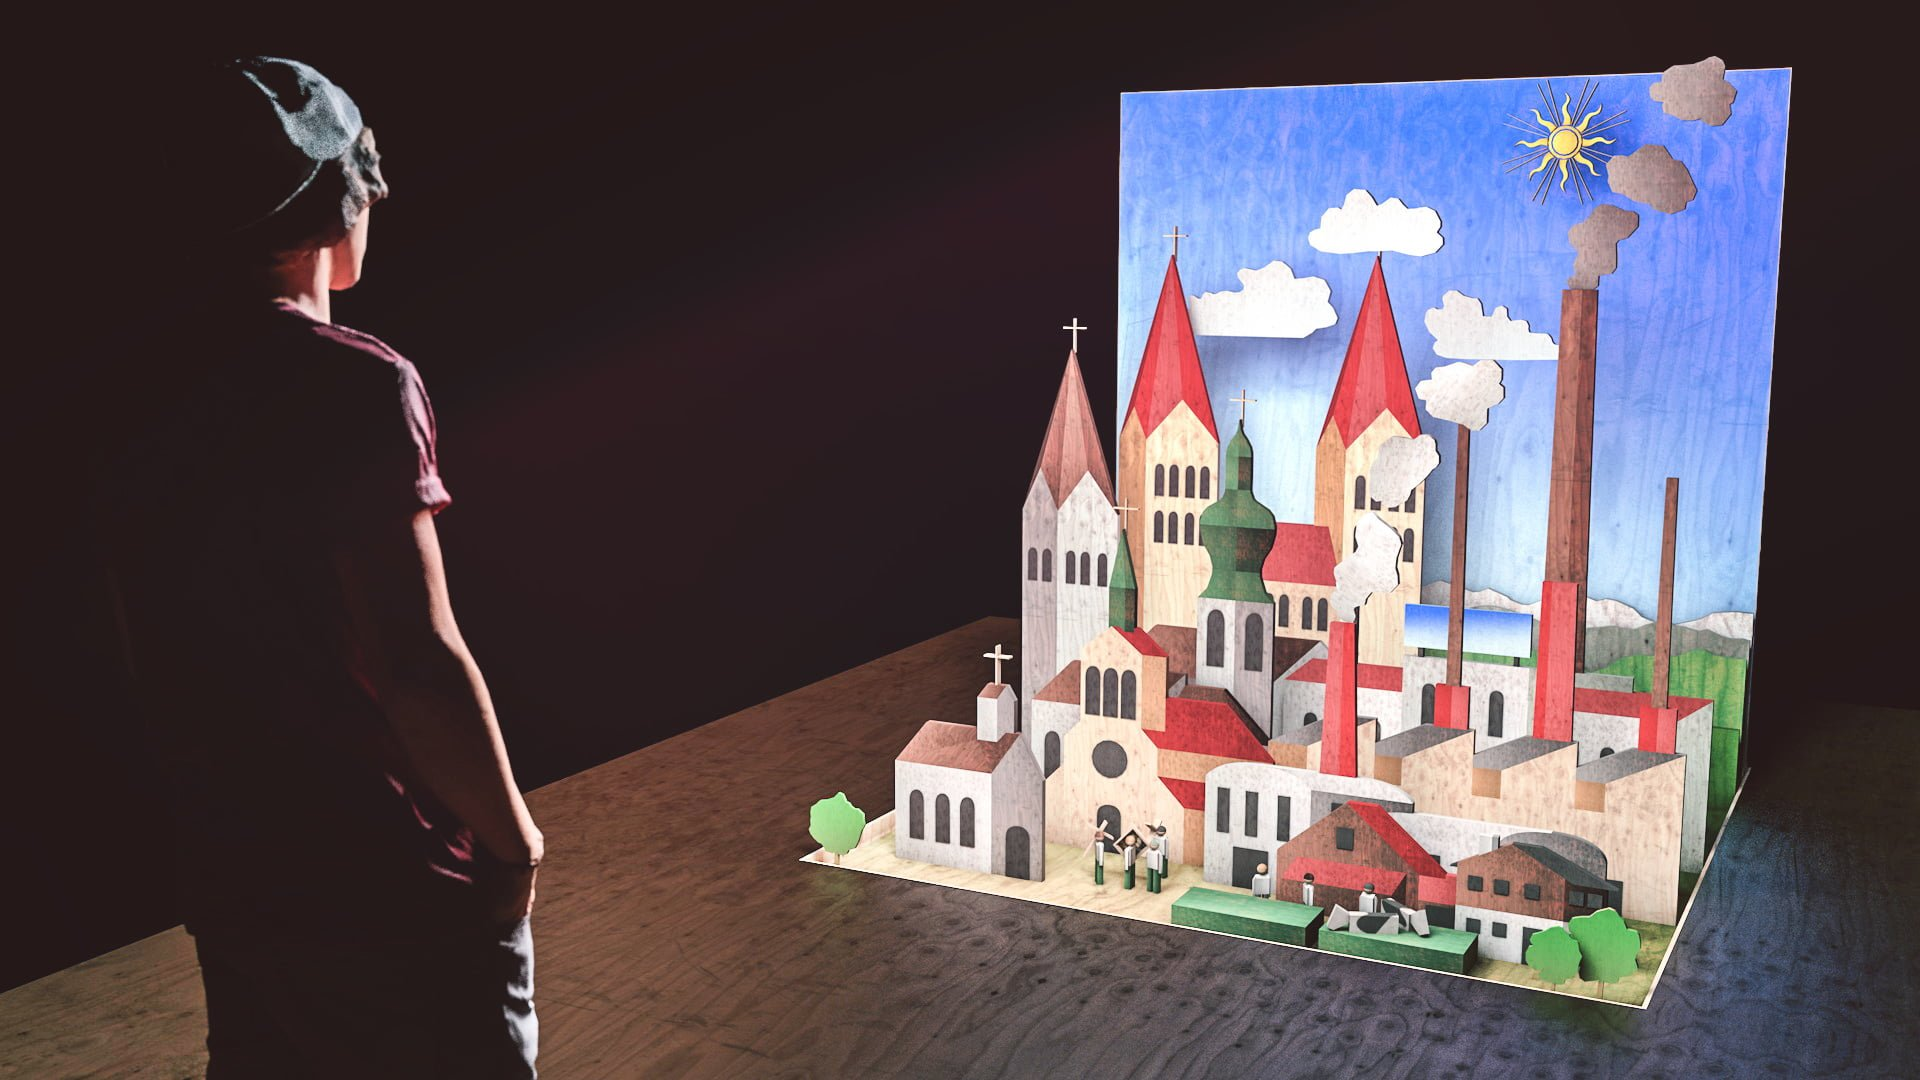 Zwingli, #ZwingliVR, Animation, Reformation, ikonaut